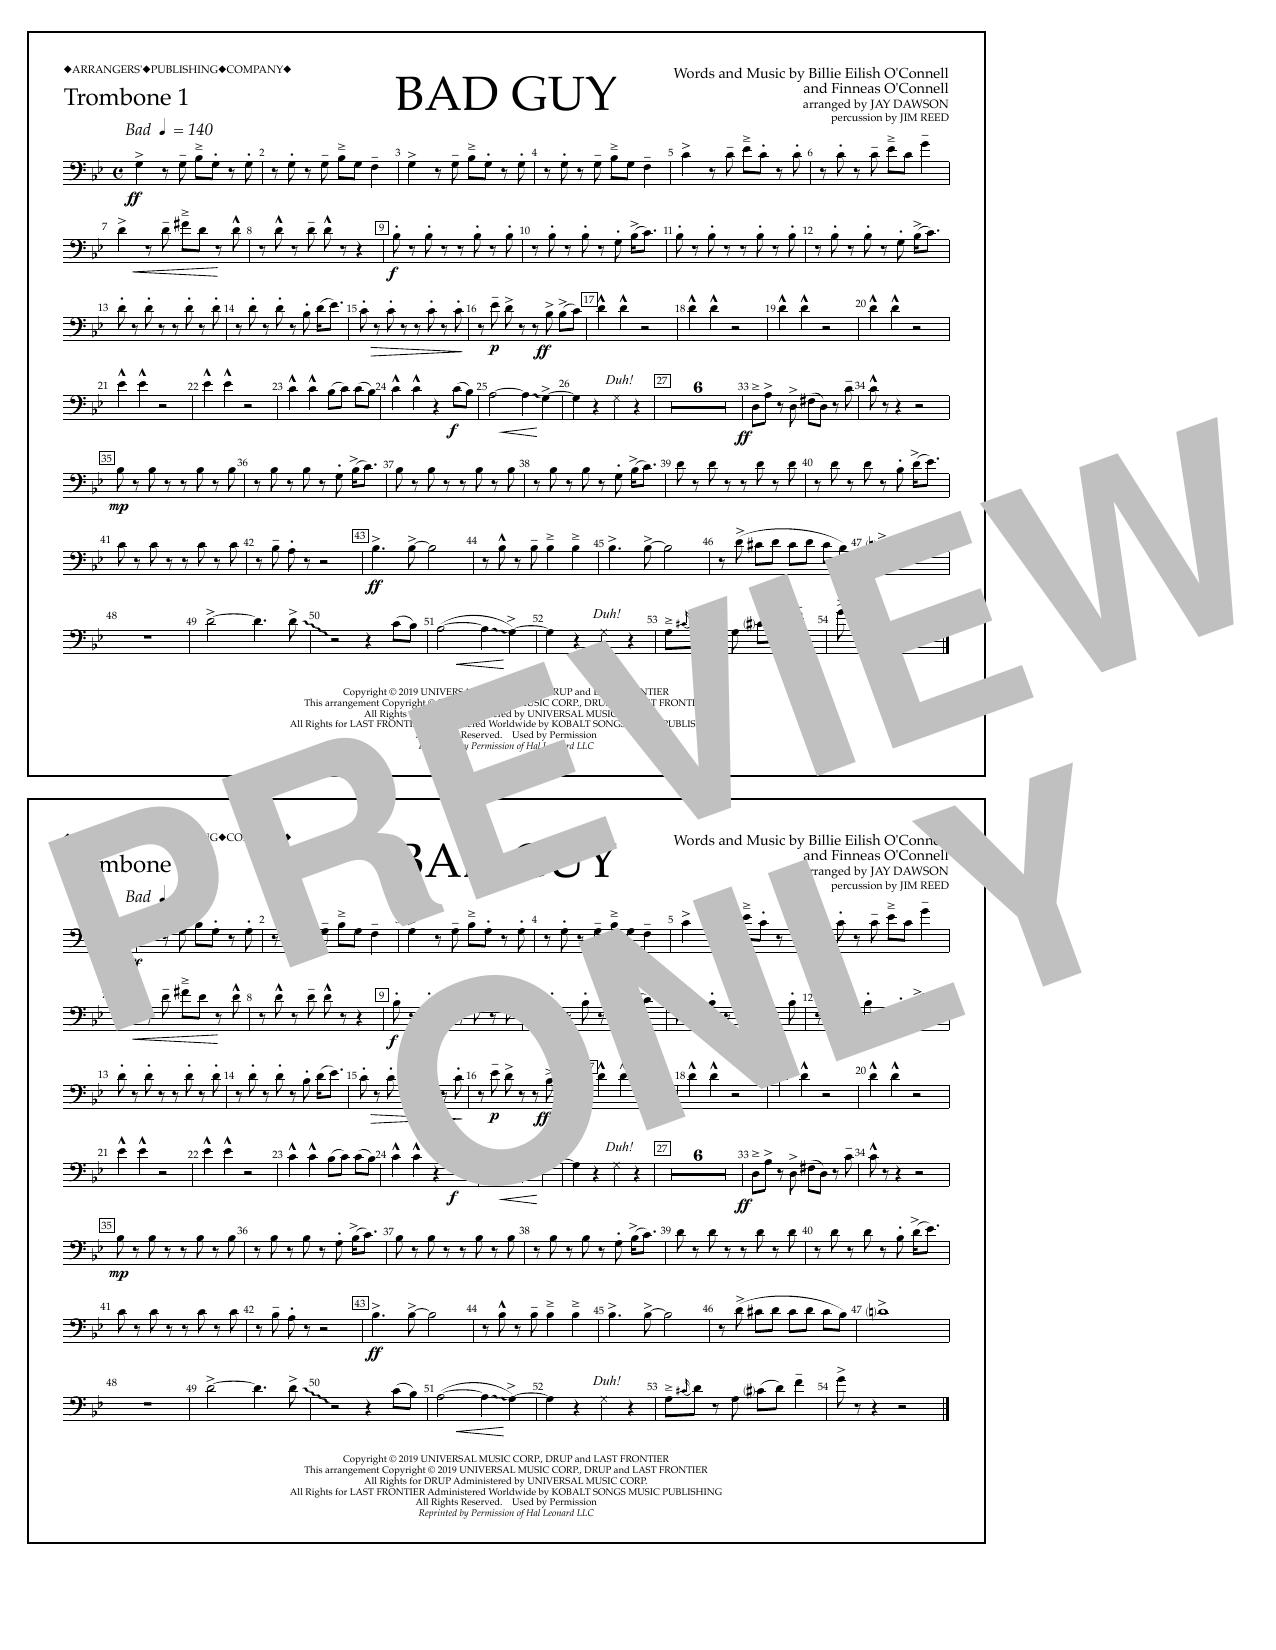 Bad Guy (arr. Jay Dawson) - Trombone 1 (Marching Band)